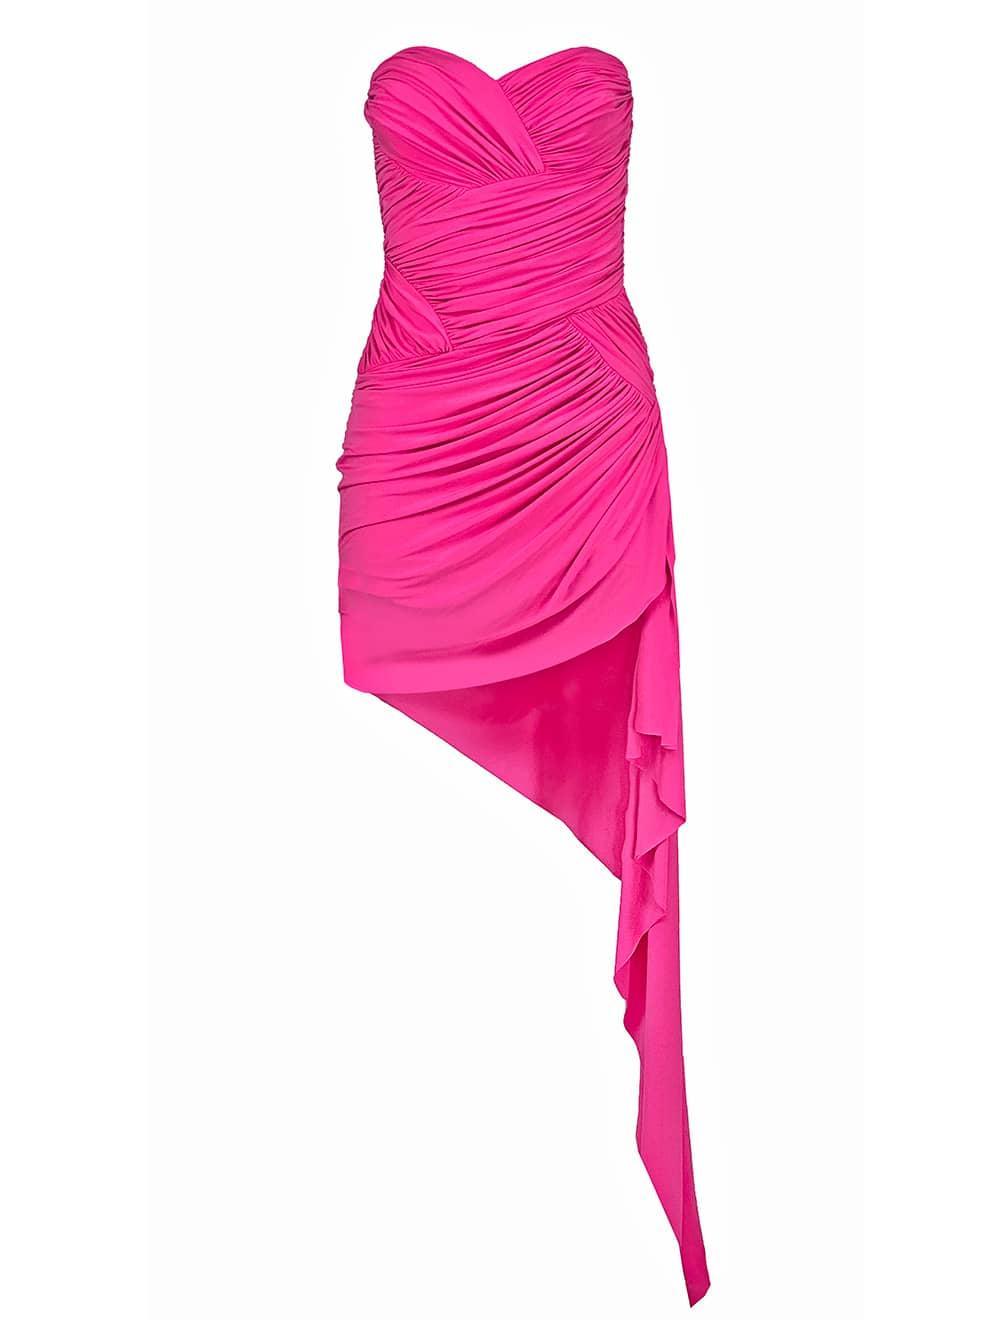 Asymmetrical Ruched Dress Item # 6991